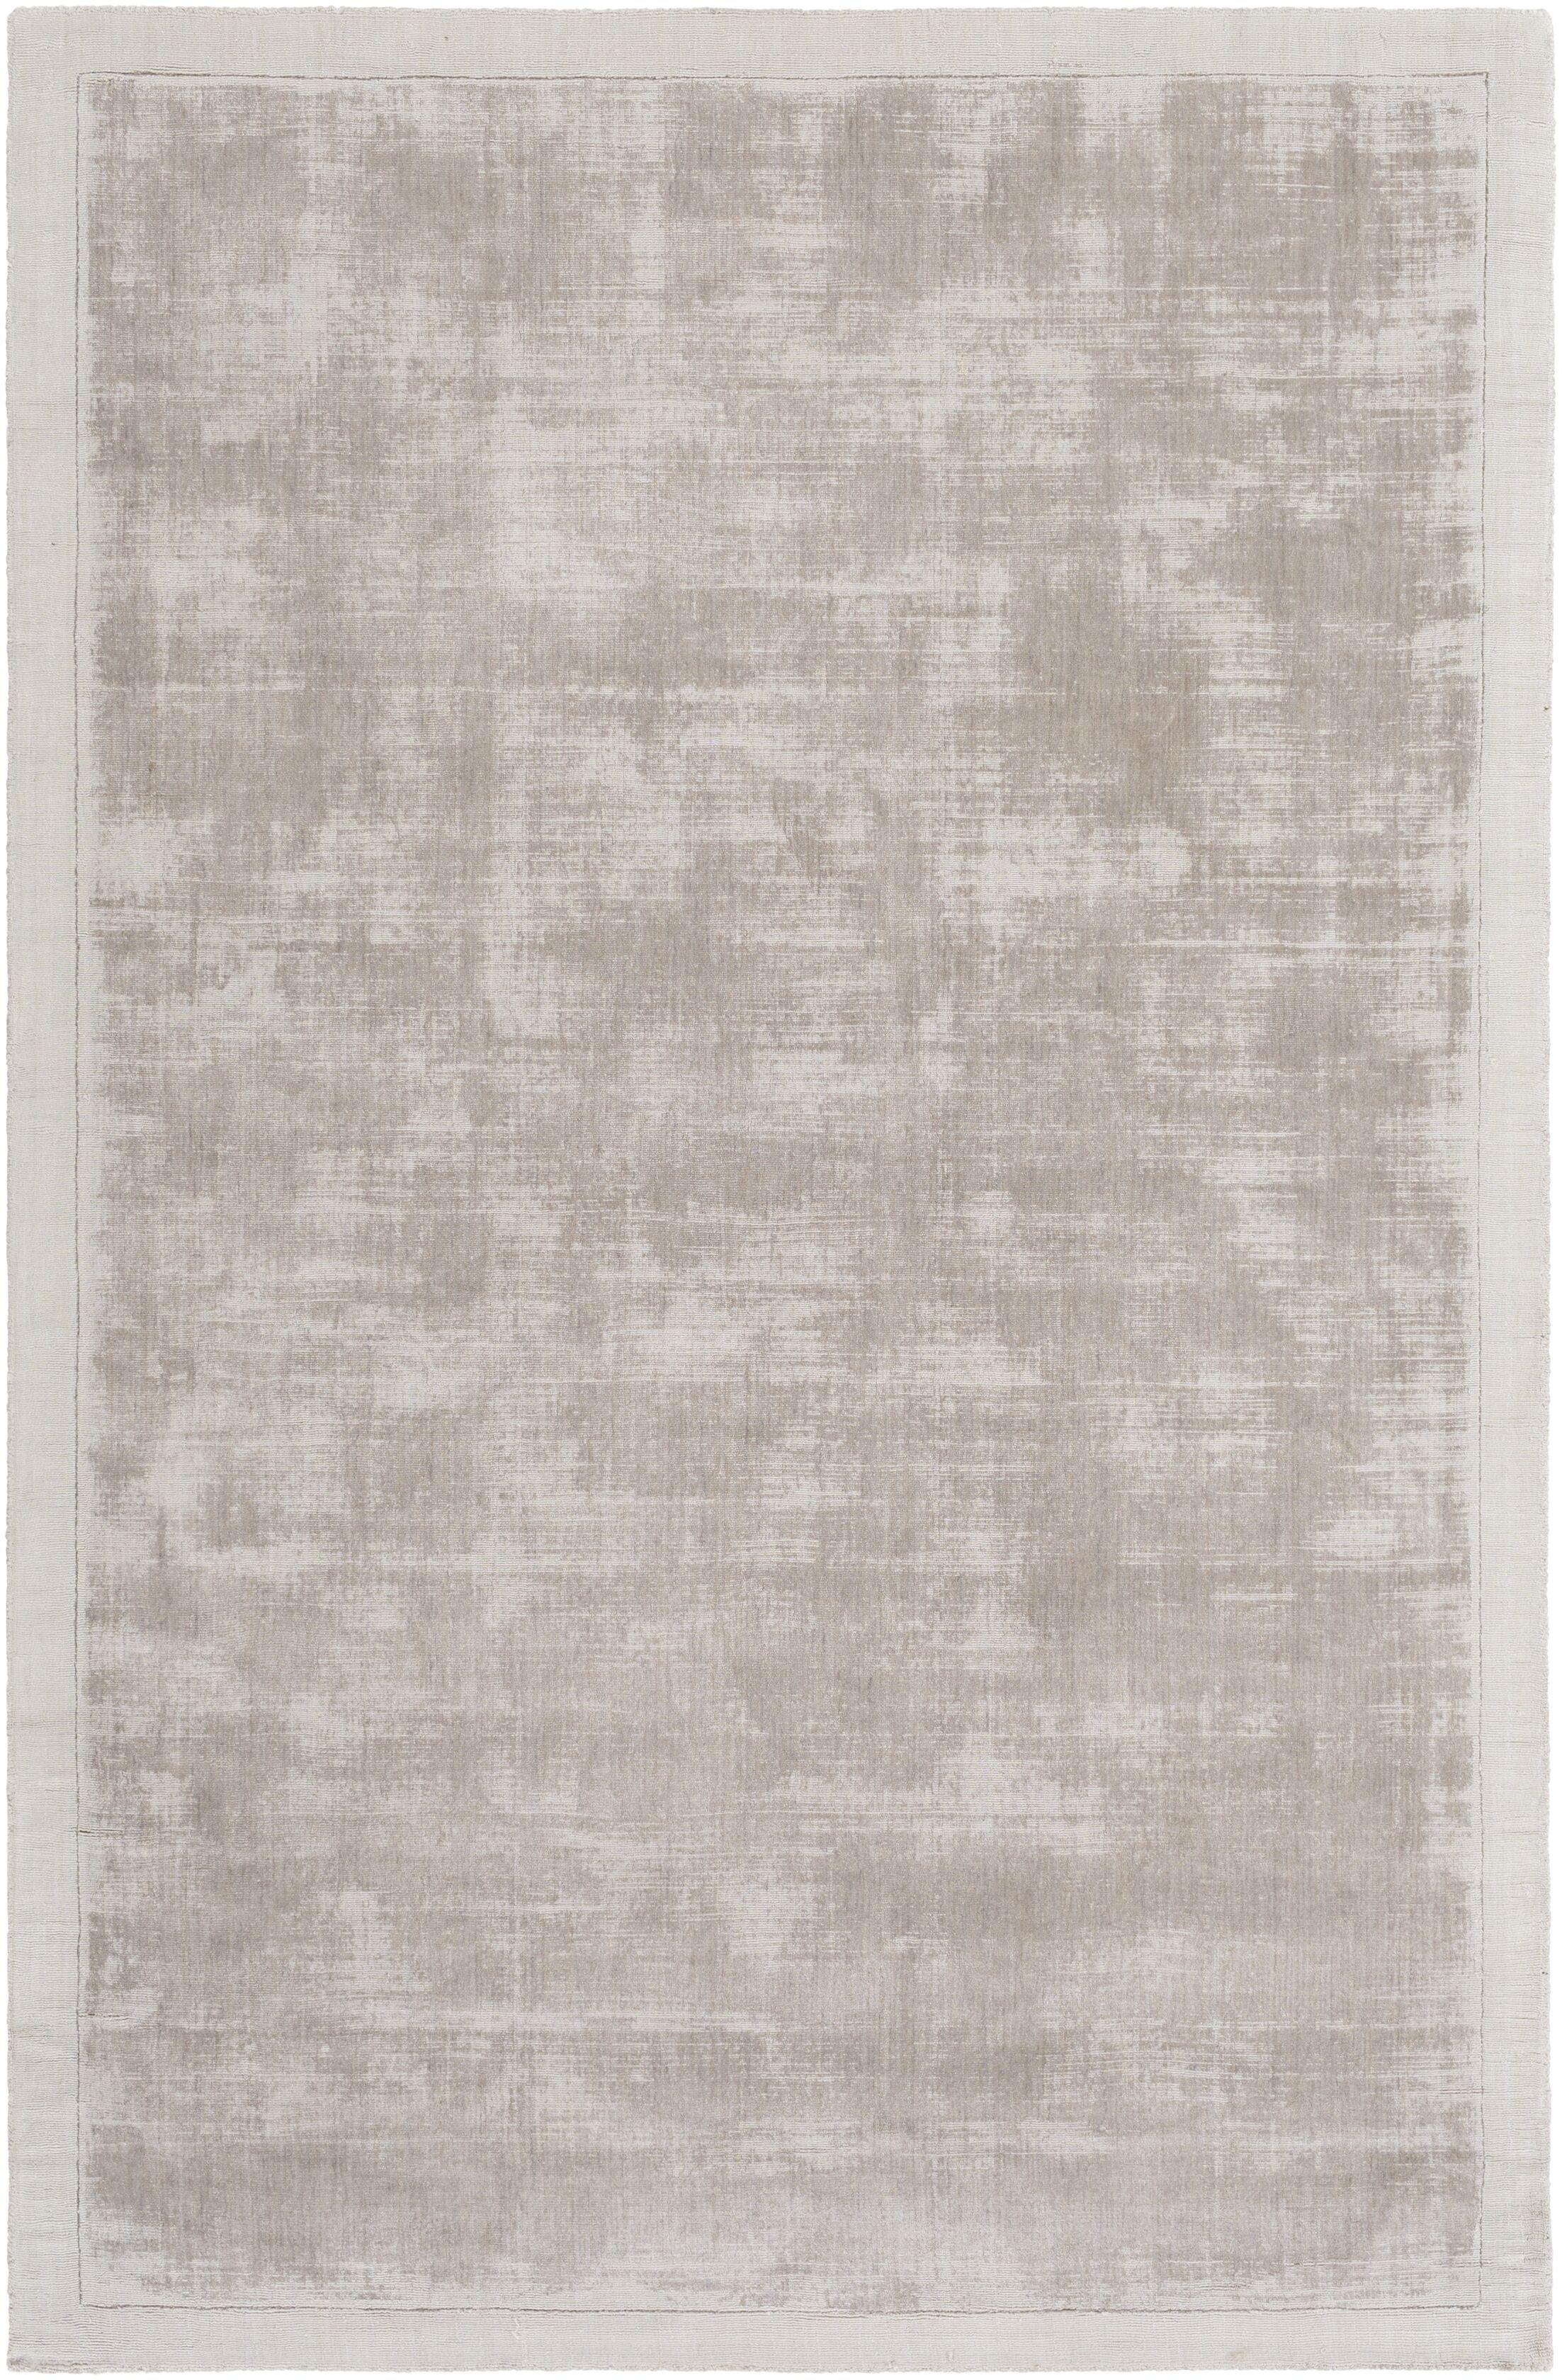 Natalie Hand-Loomed Gray Area Rug Rug Size: Rectangle 4' x 6'